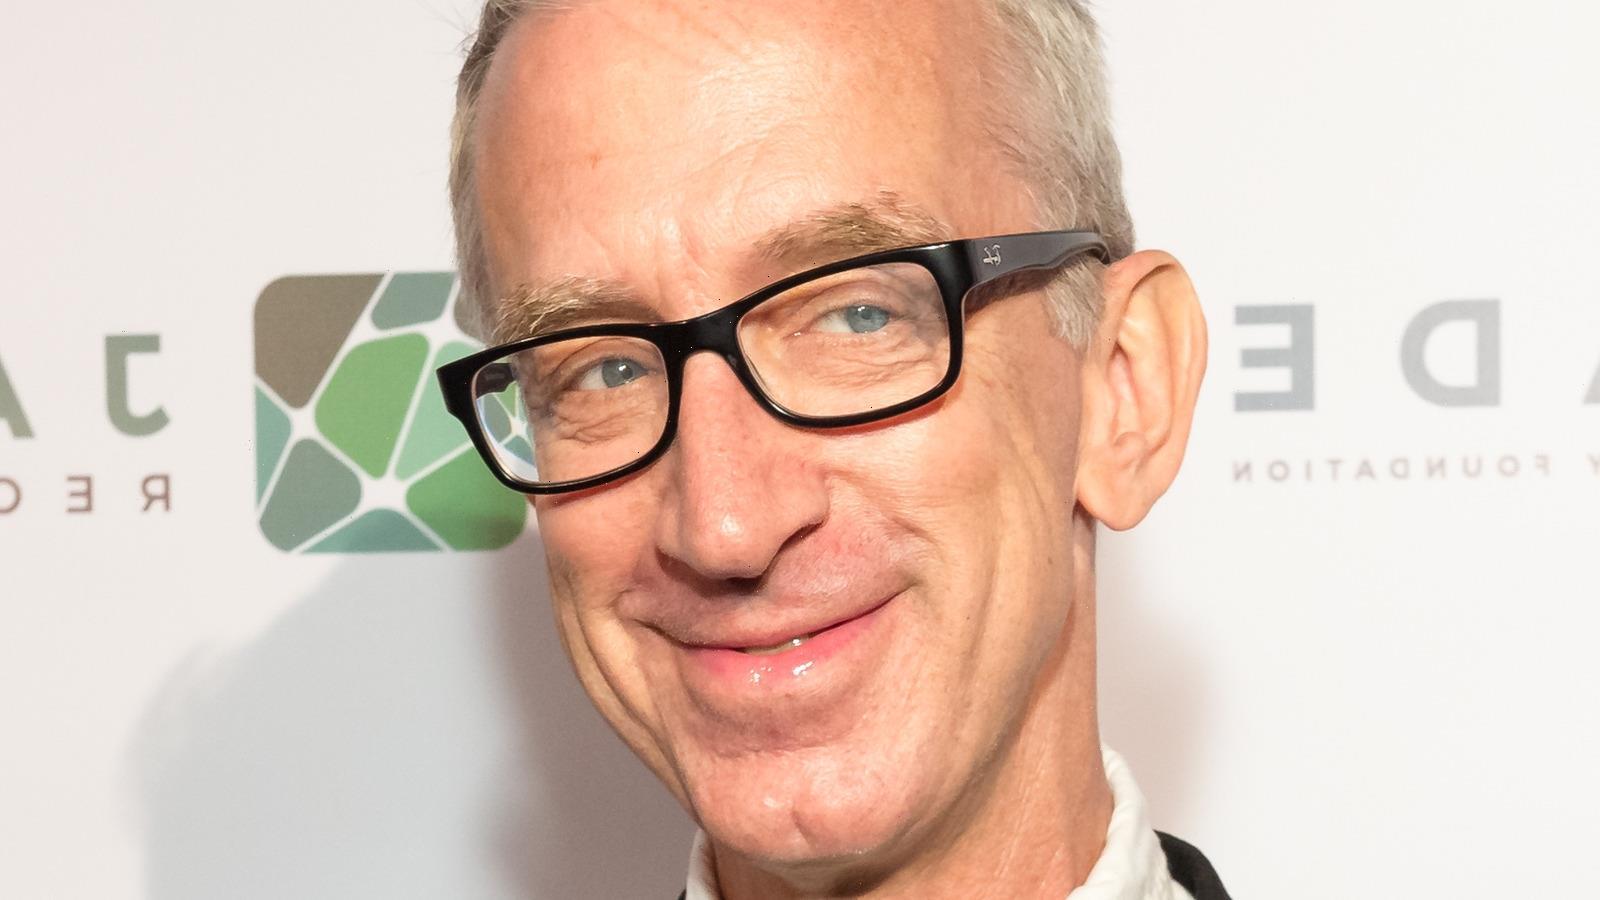 The Real Reason Andy Dick Said No To A Job On SNL